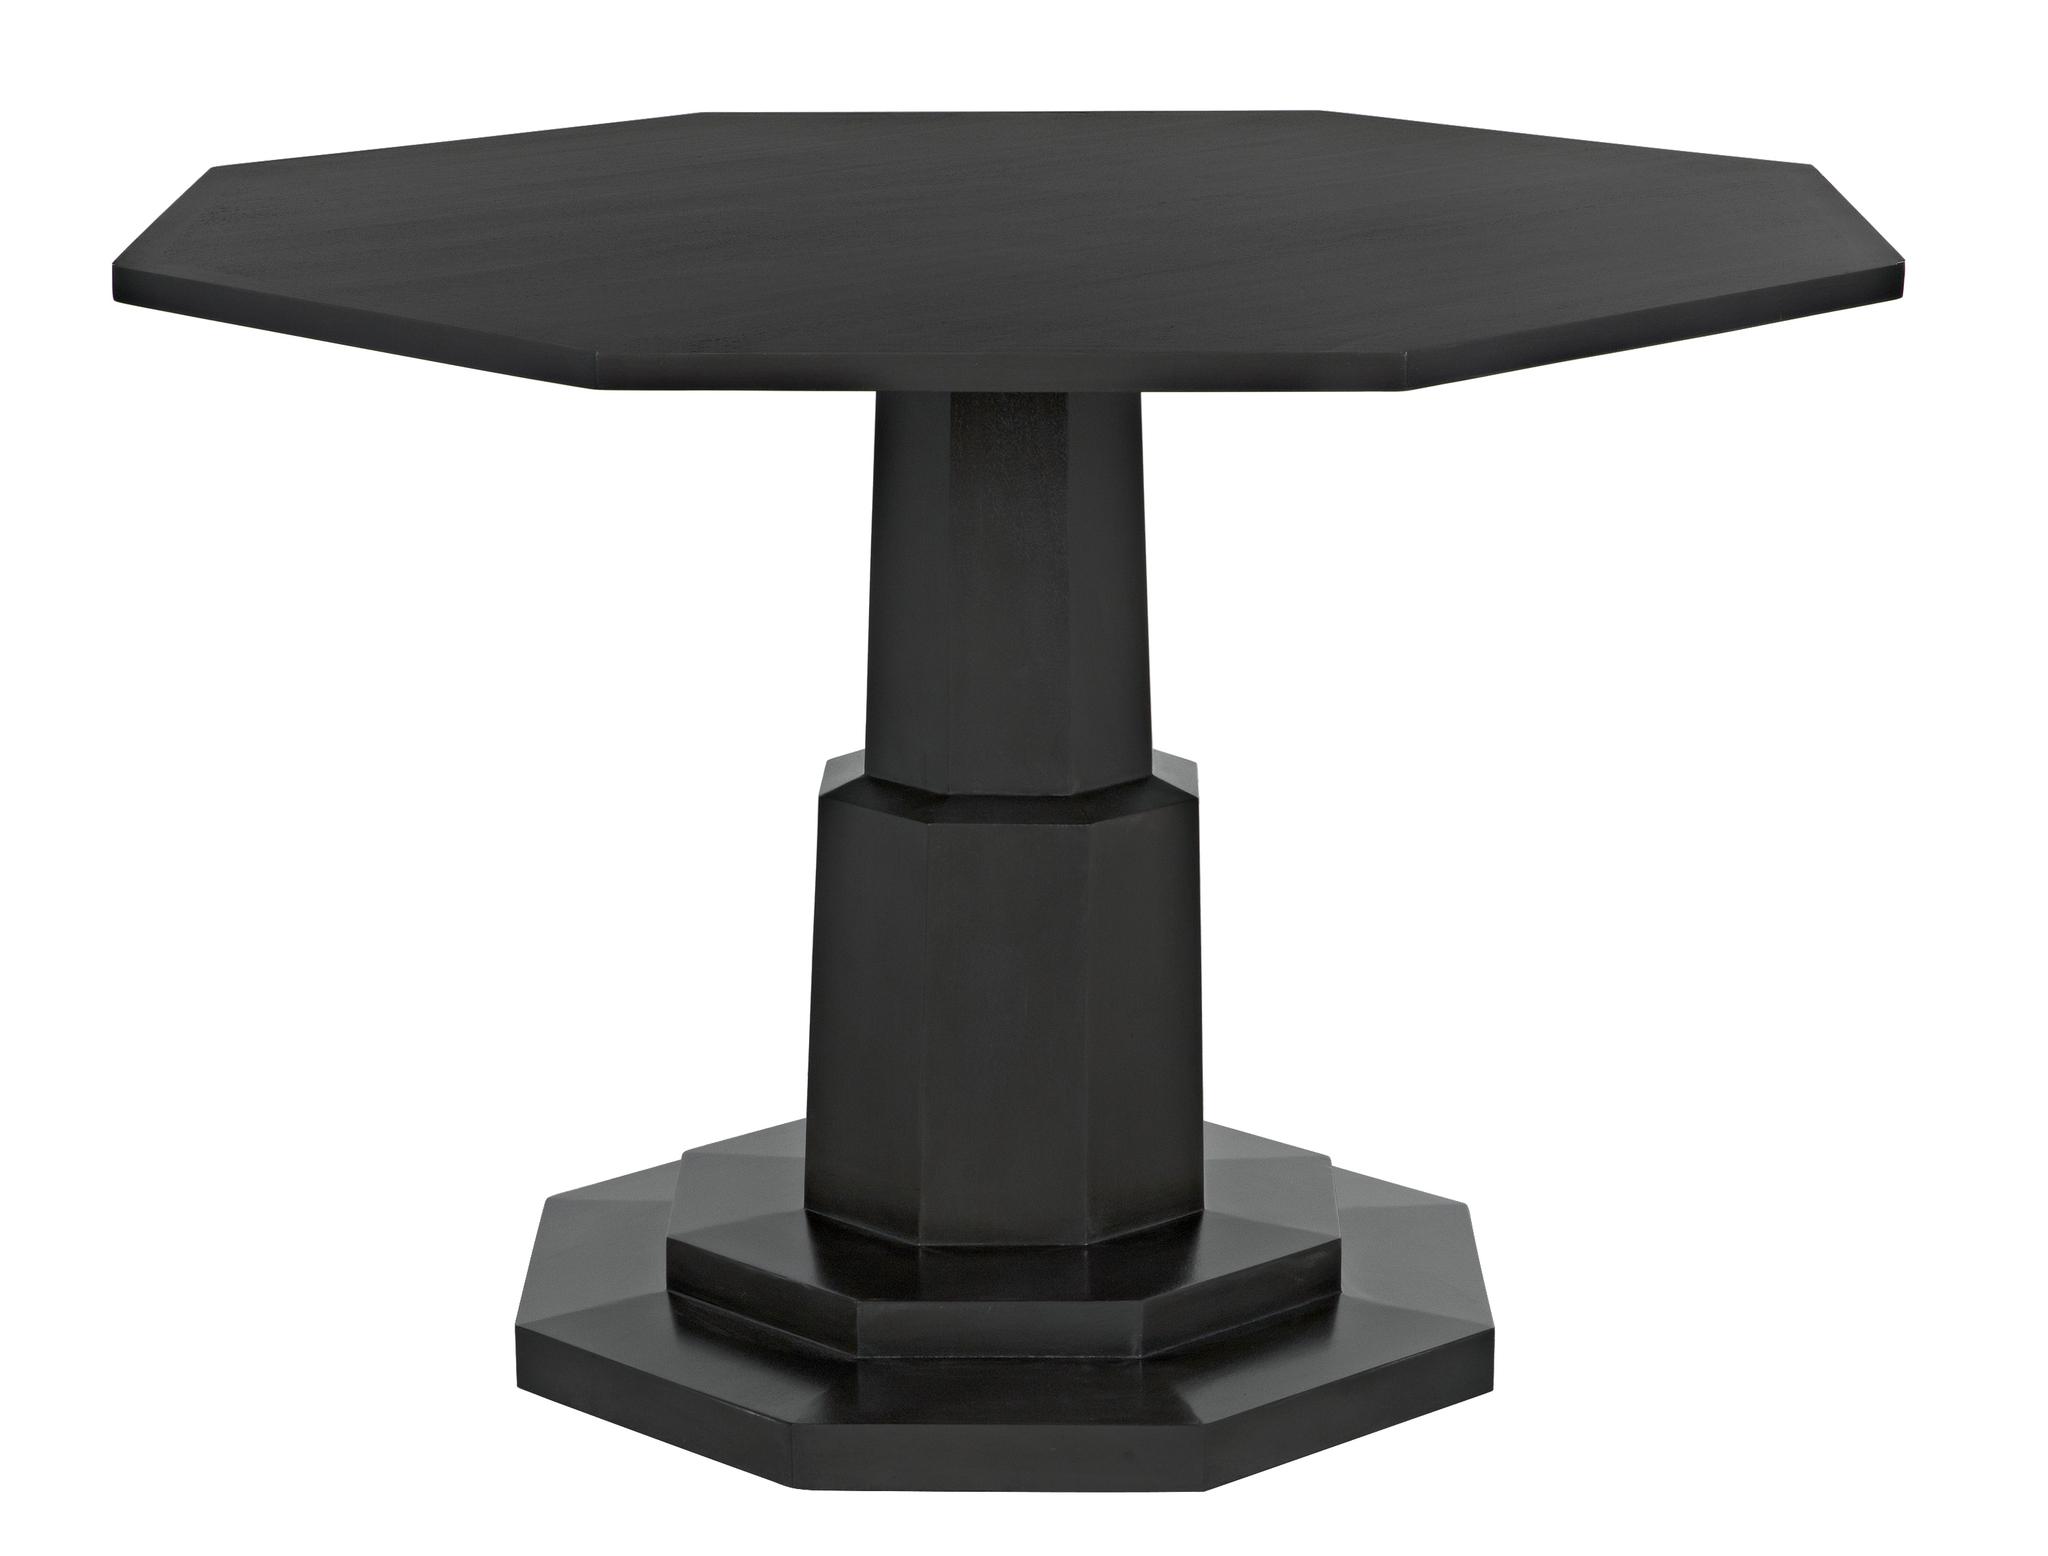 QS Octagon Table Pale dining tables noir